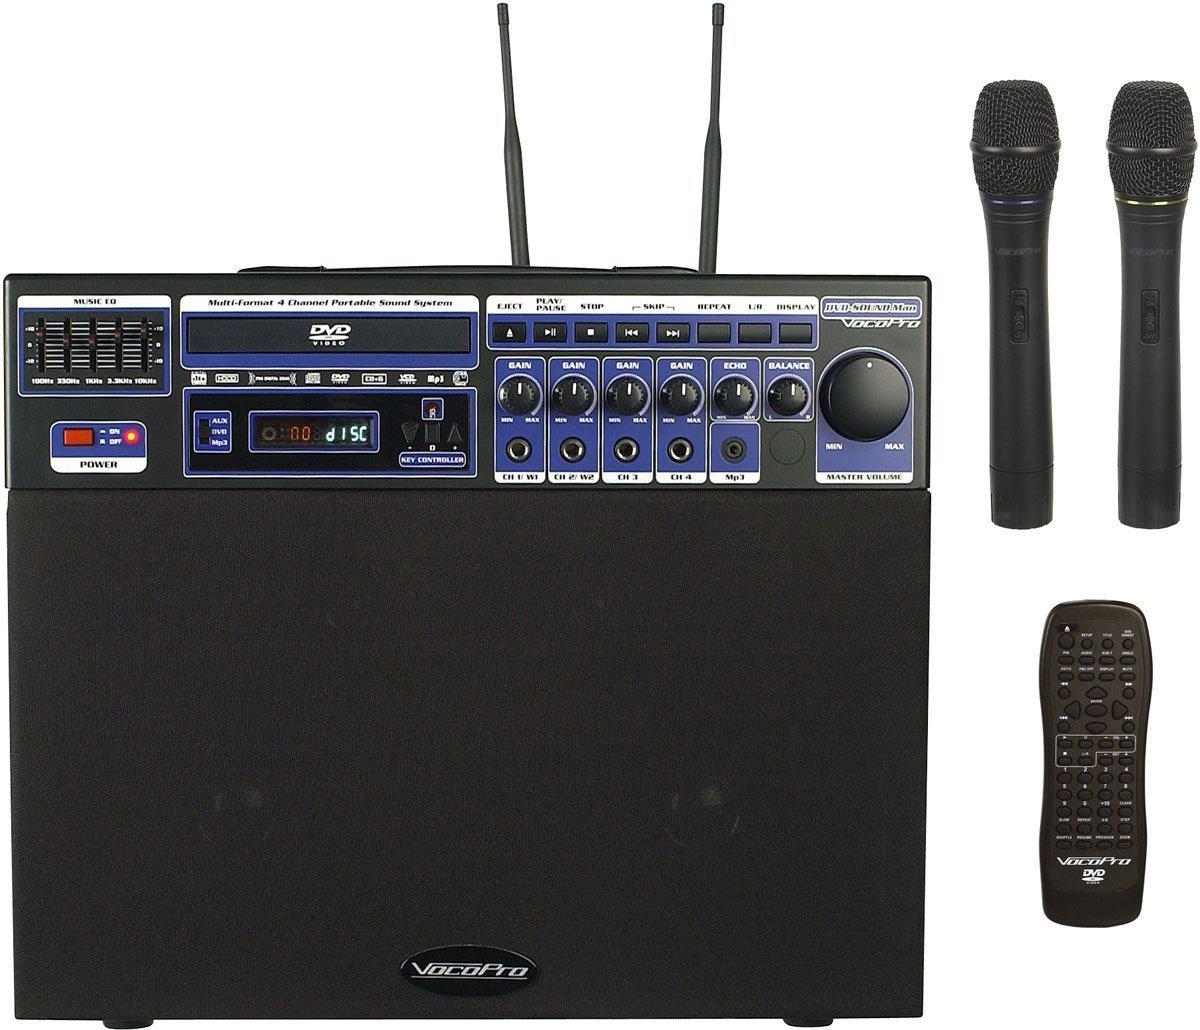 bose karaoke system price. amazon.com: vocopro dvd-soundman 80w multi-format 4 channel portable sound system with 2 wireless mic module: musical instruments bose karaoke price